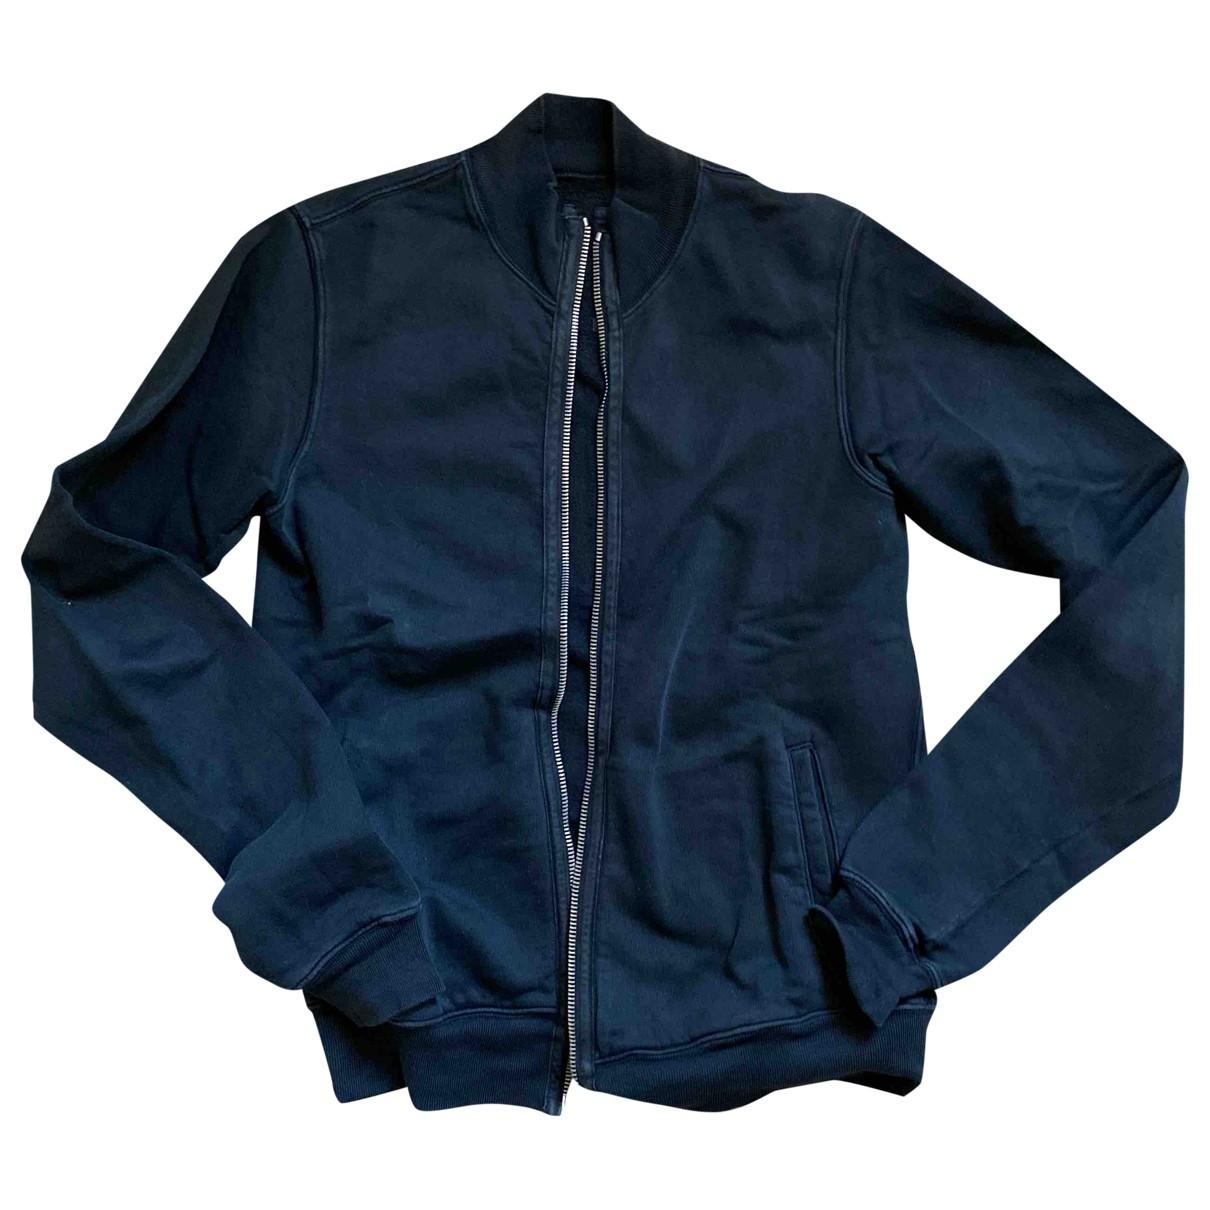 Rick Owens Drkshdw \N Black Cotton Knitwear & Sweatshirts for Men S International